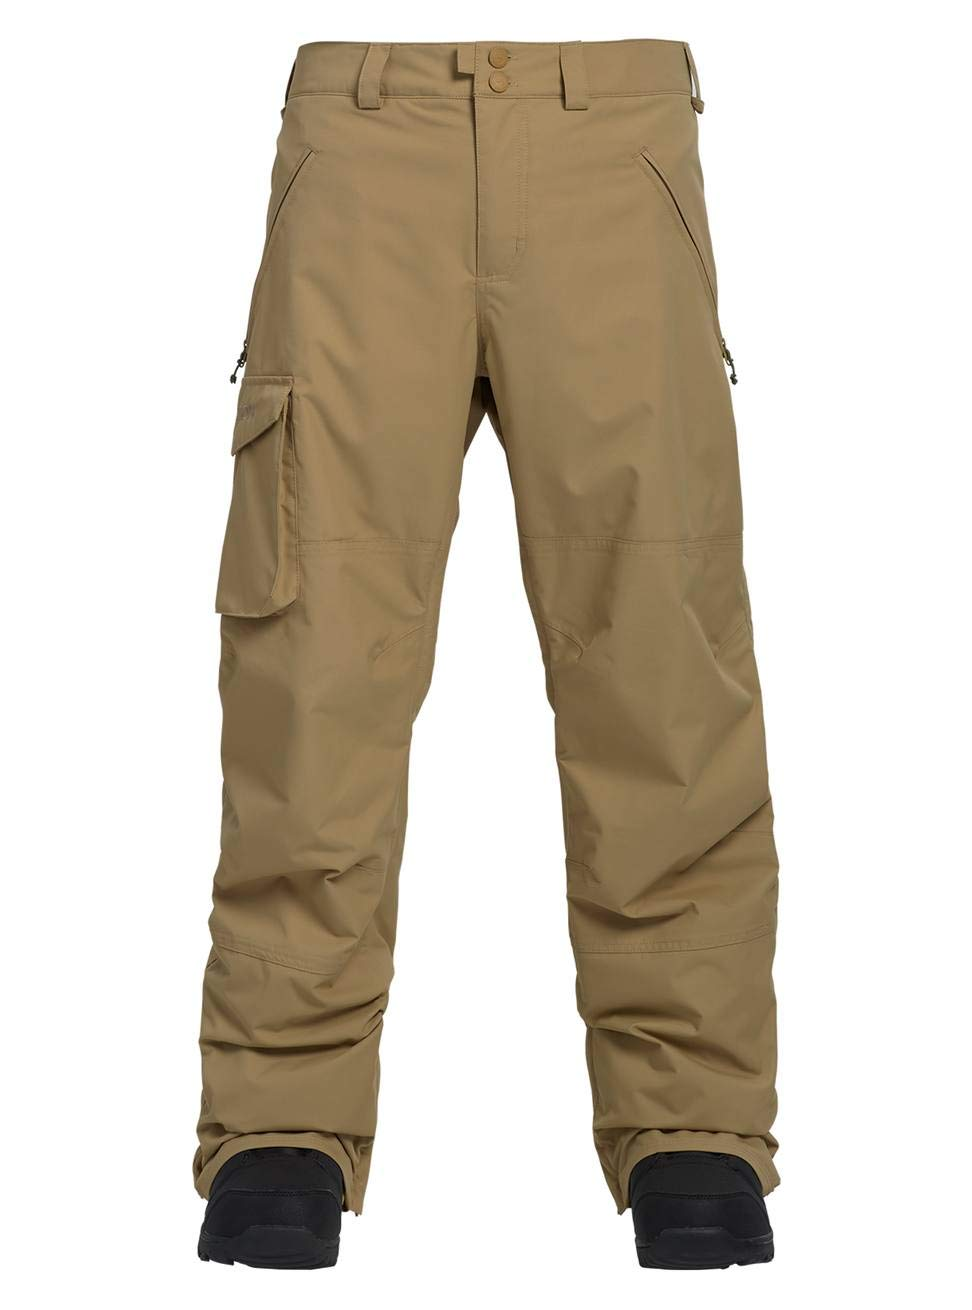 Beige XS Burton Covert Pantalon de Snowboard Homme